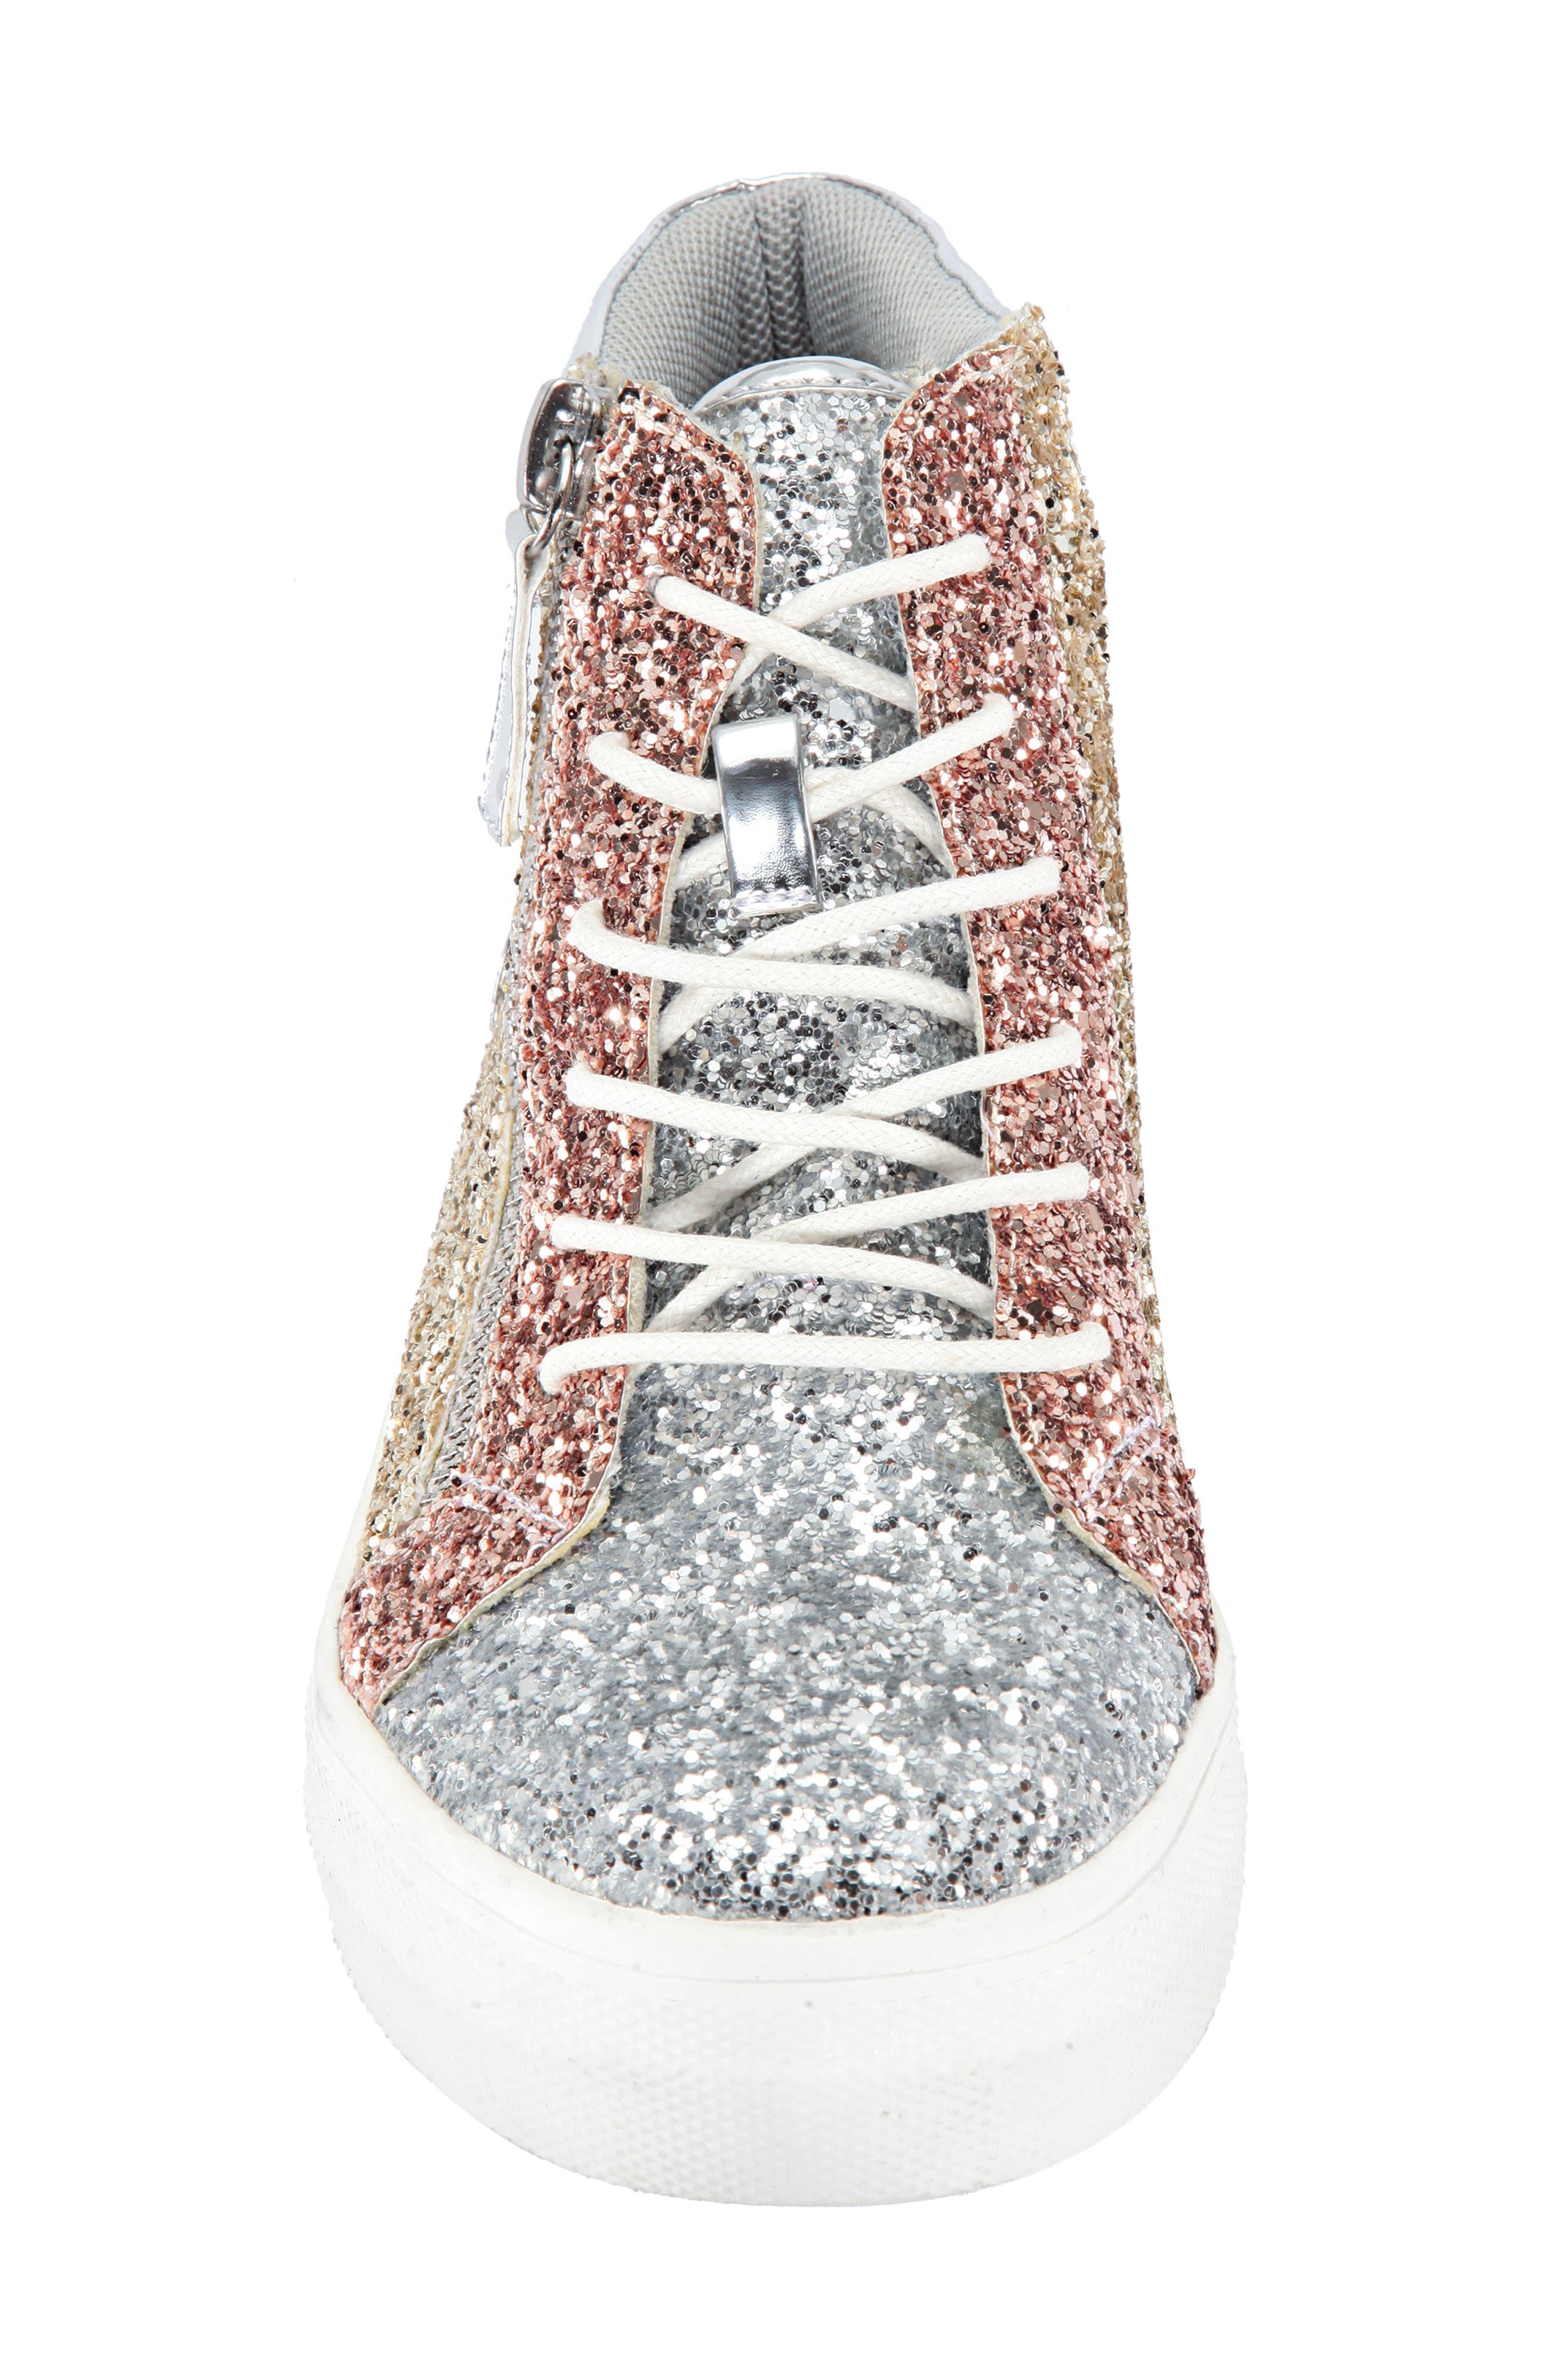 Hylda Glitter High Top Sneaker,                             Alternate thumbnail 4, color,                             SILVER MULTI GLITTER/ PATENT